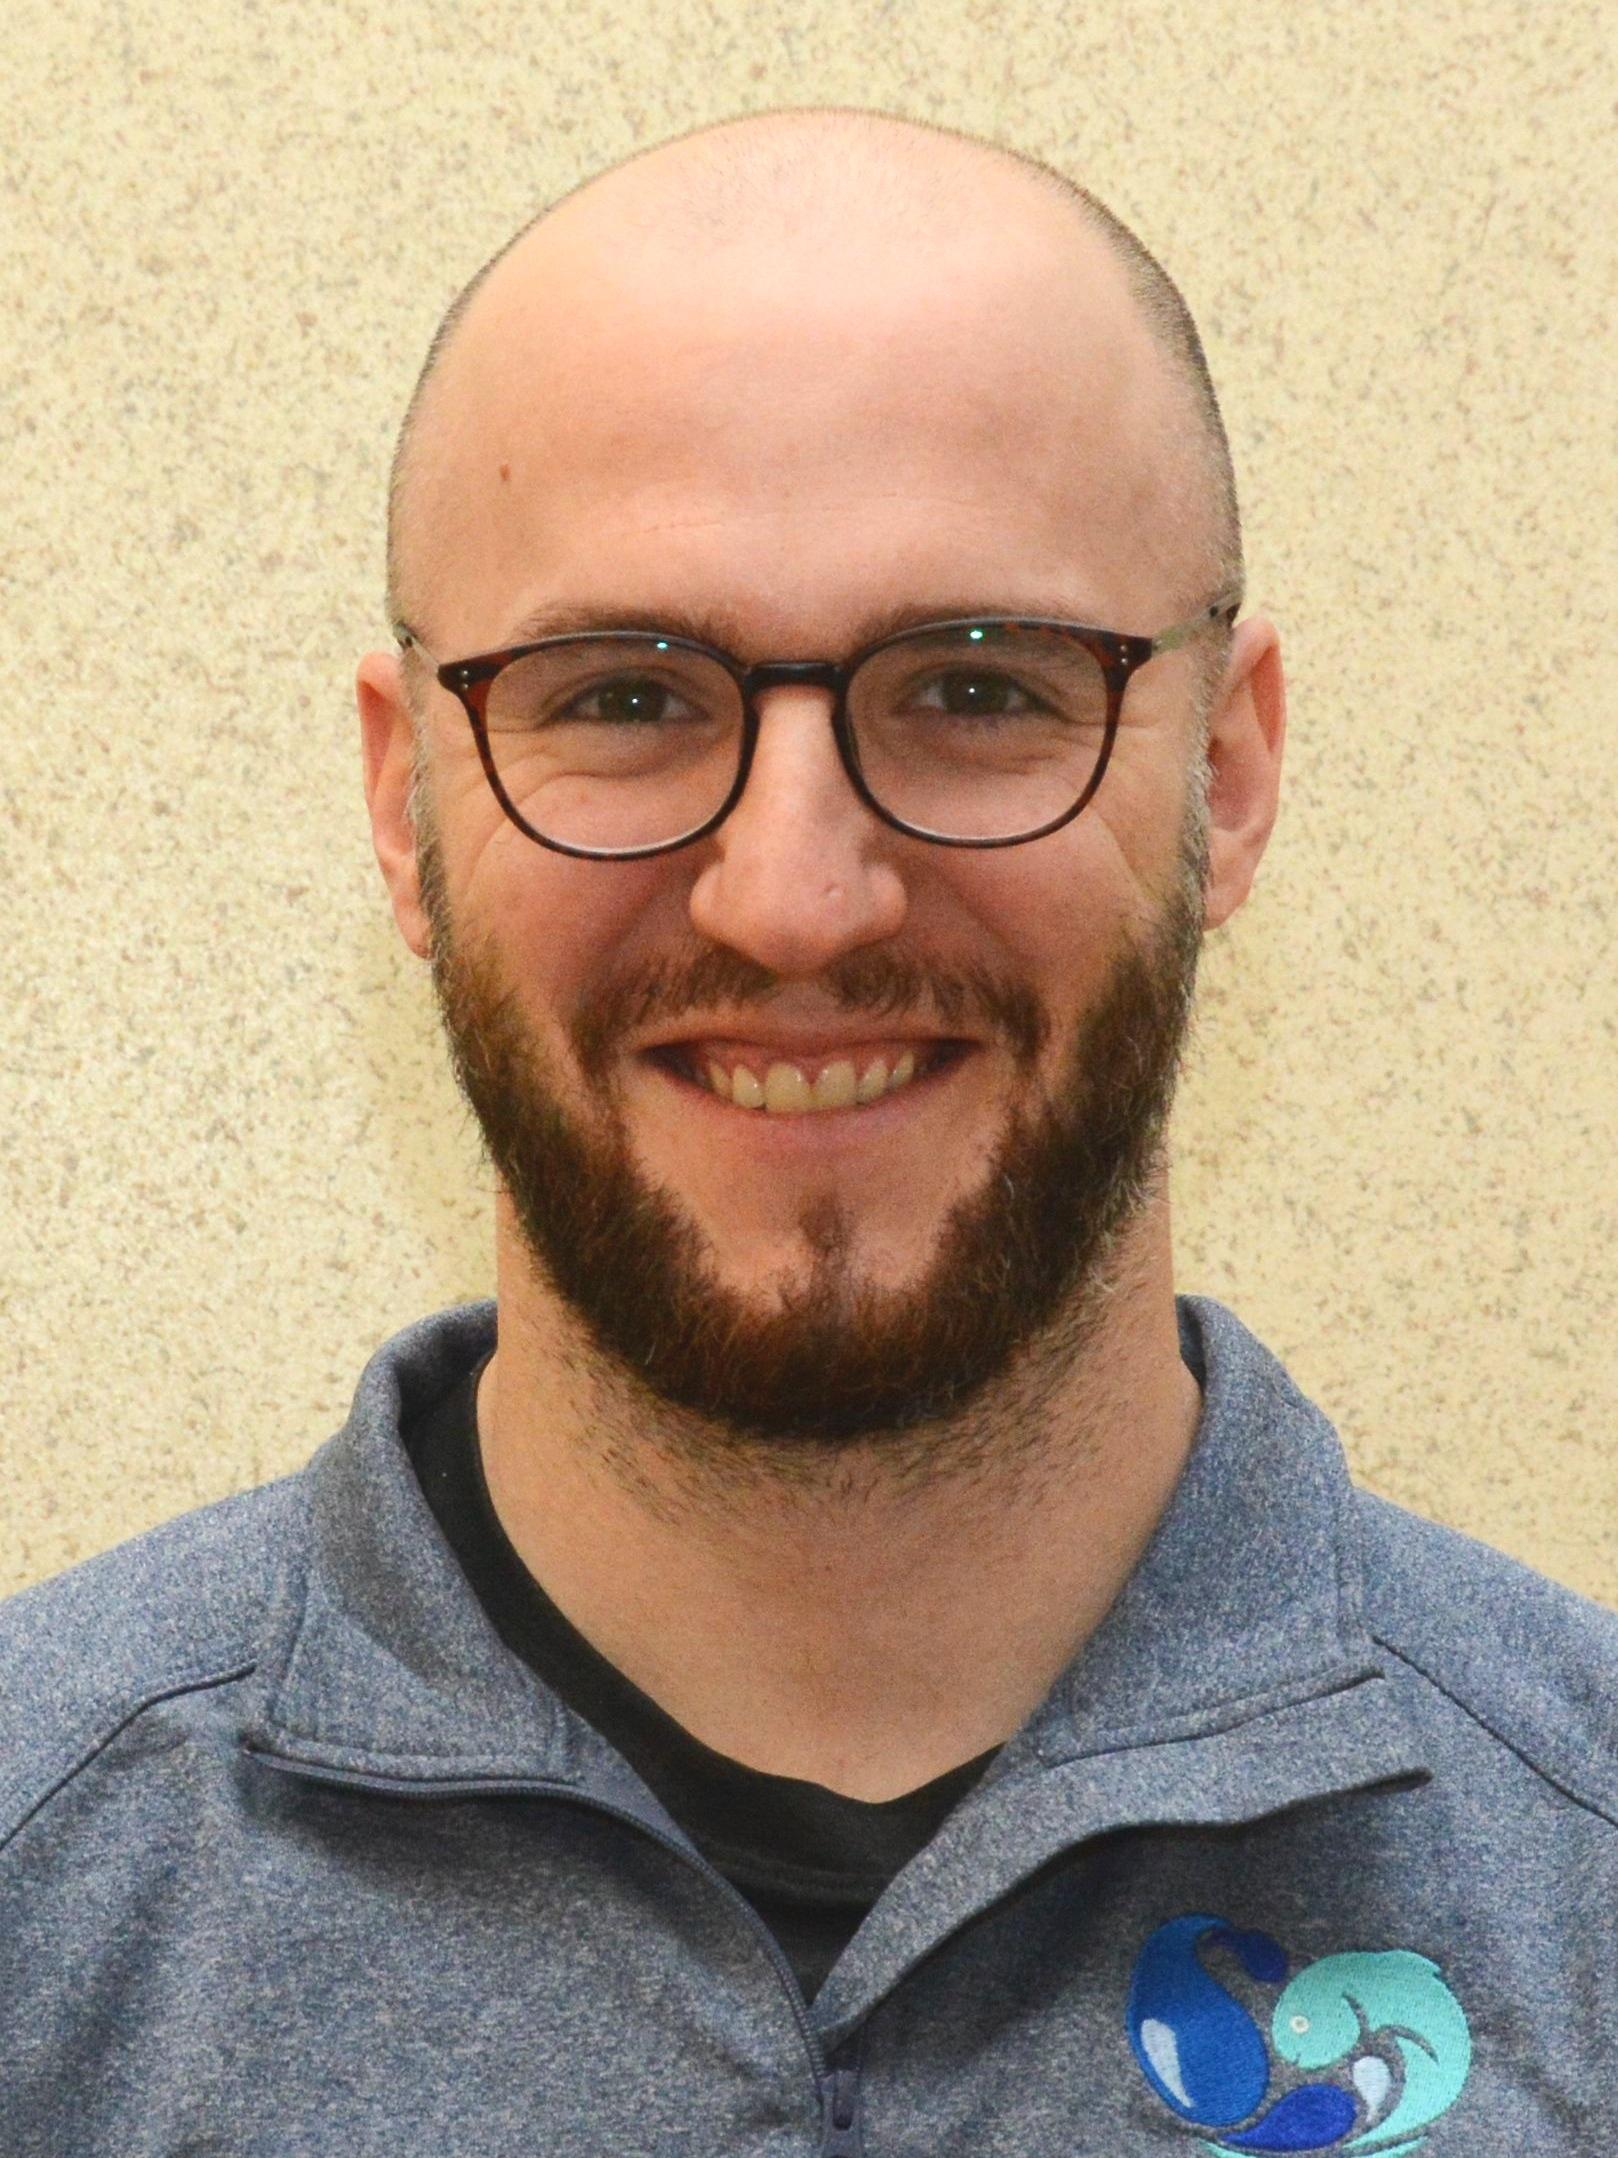 Ben Wegleitner  TCPWQ Stormwater Educator   bwegleitner@lafayette.in.gov